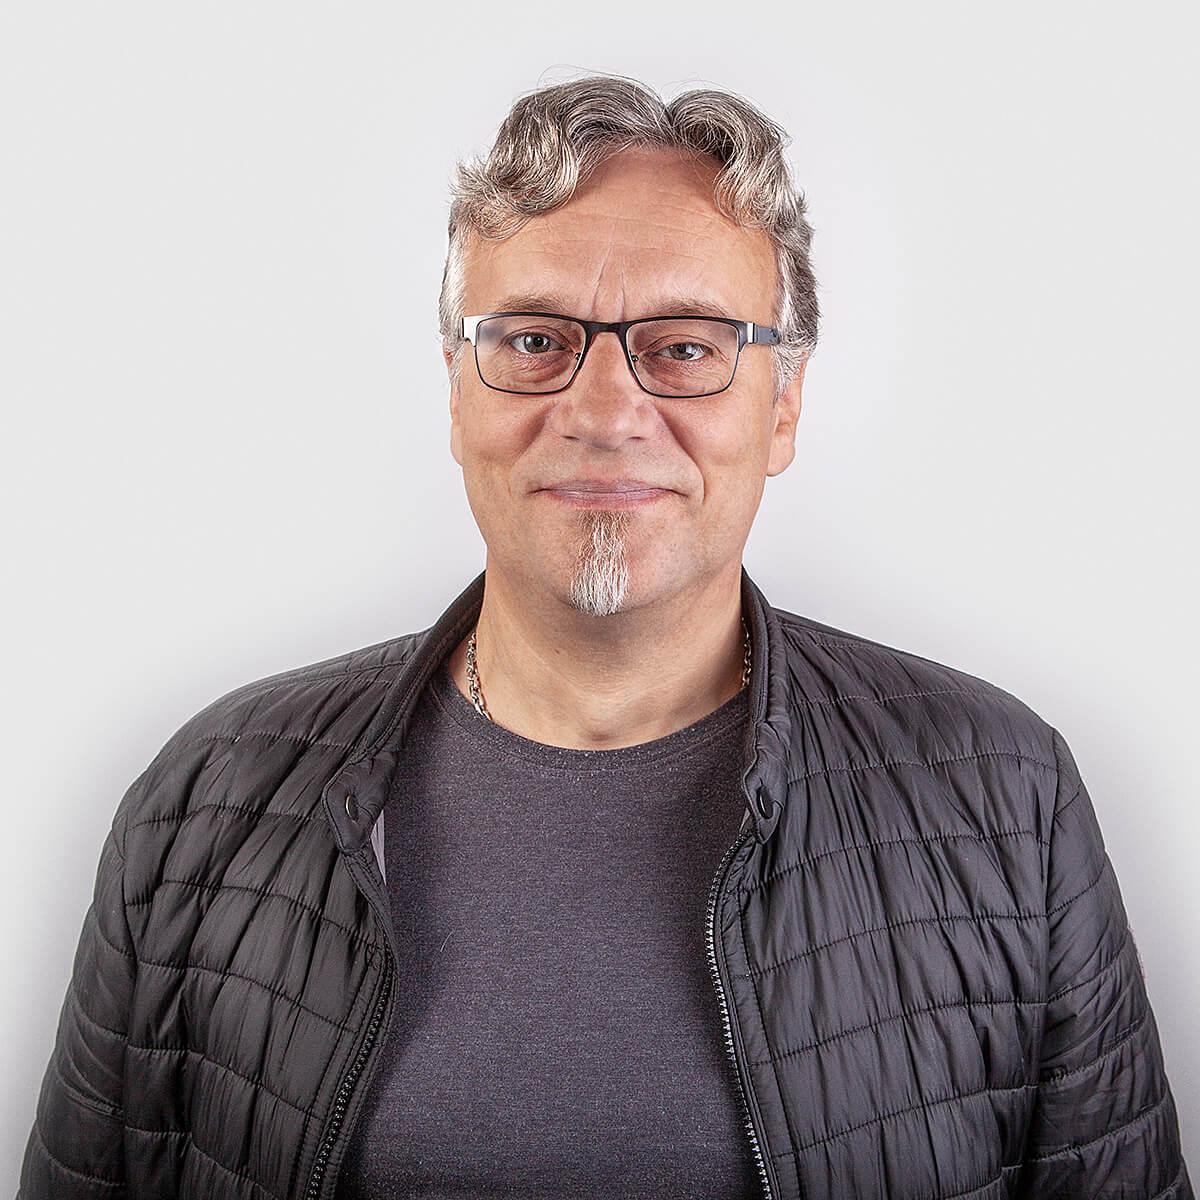 Dánjal Jákup Jakobsen stillar upp fyri Tjóðveldi